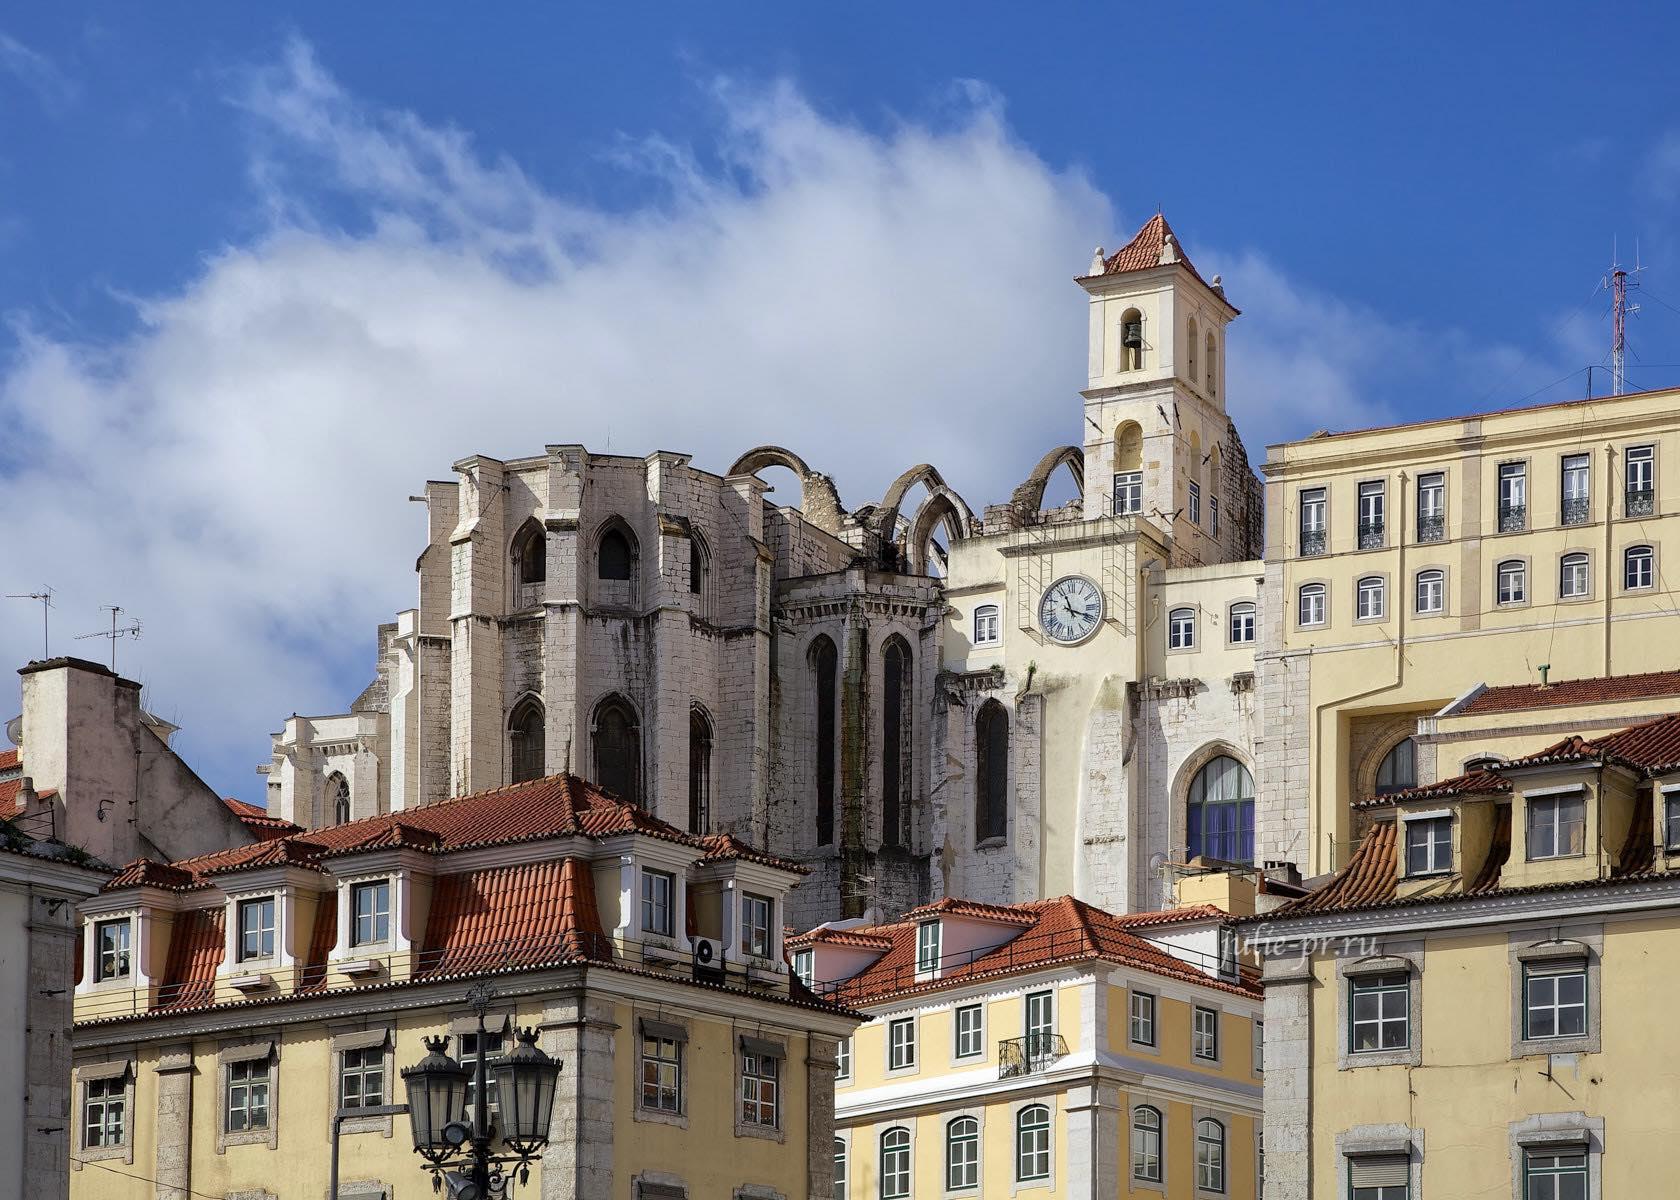 Португалия, Лиссабон, Монастырь кармелиток